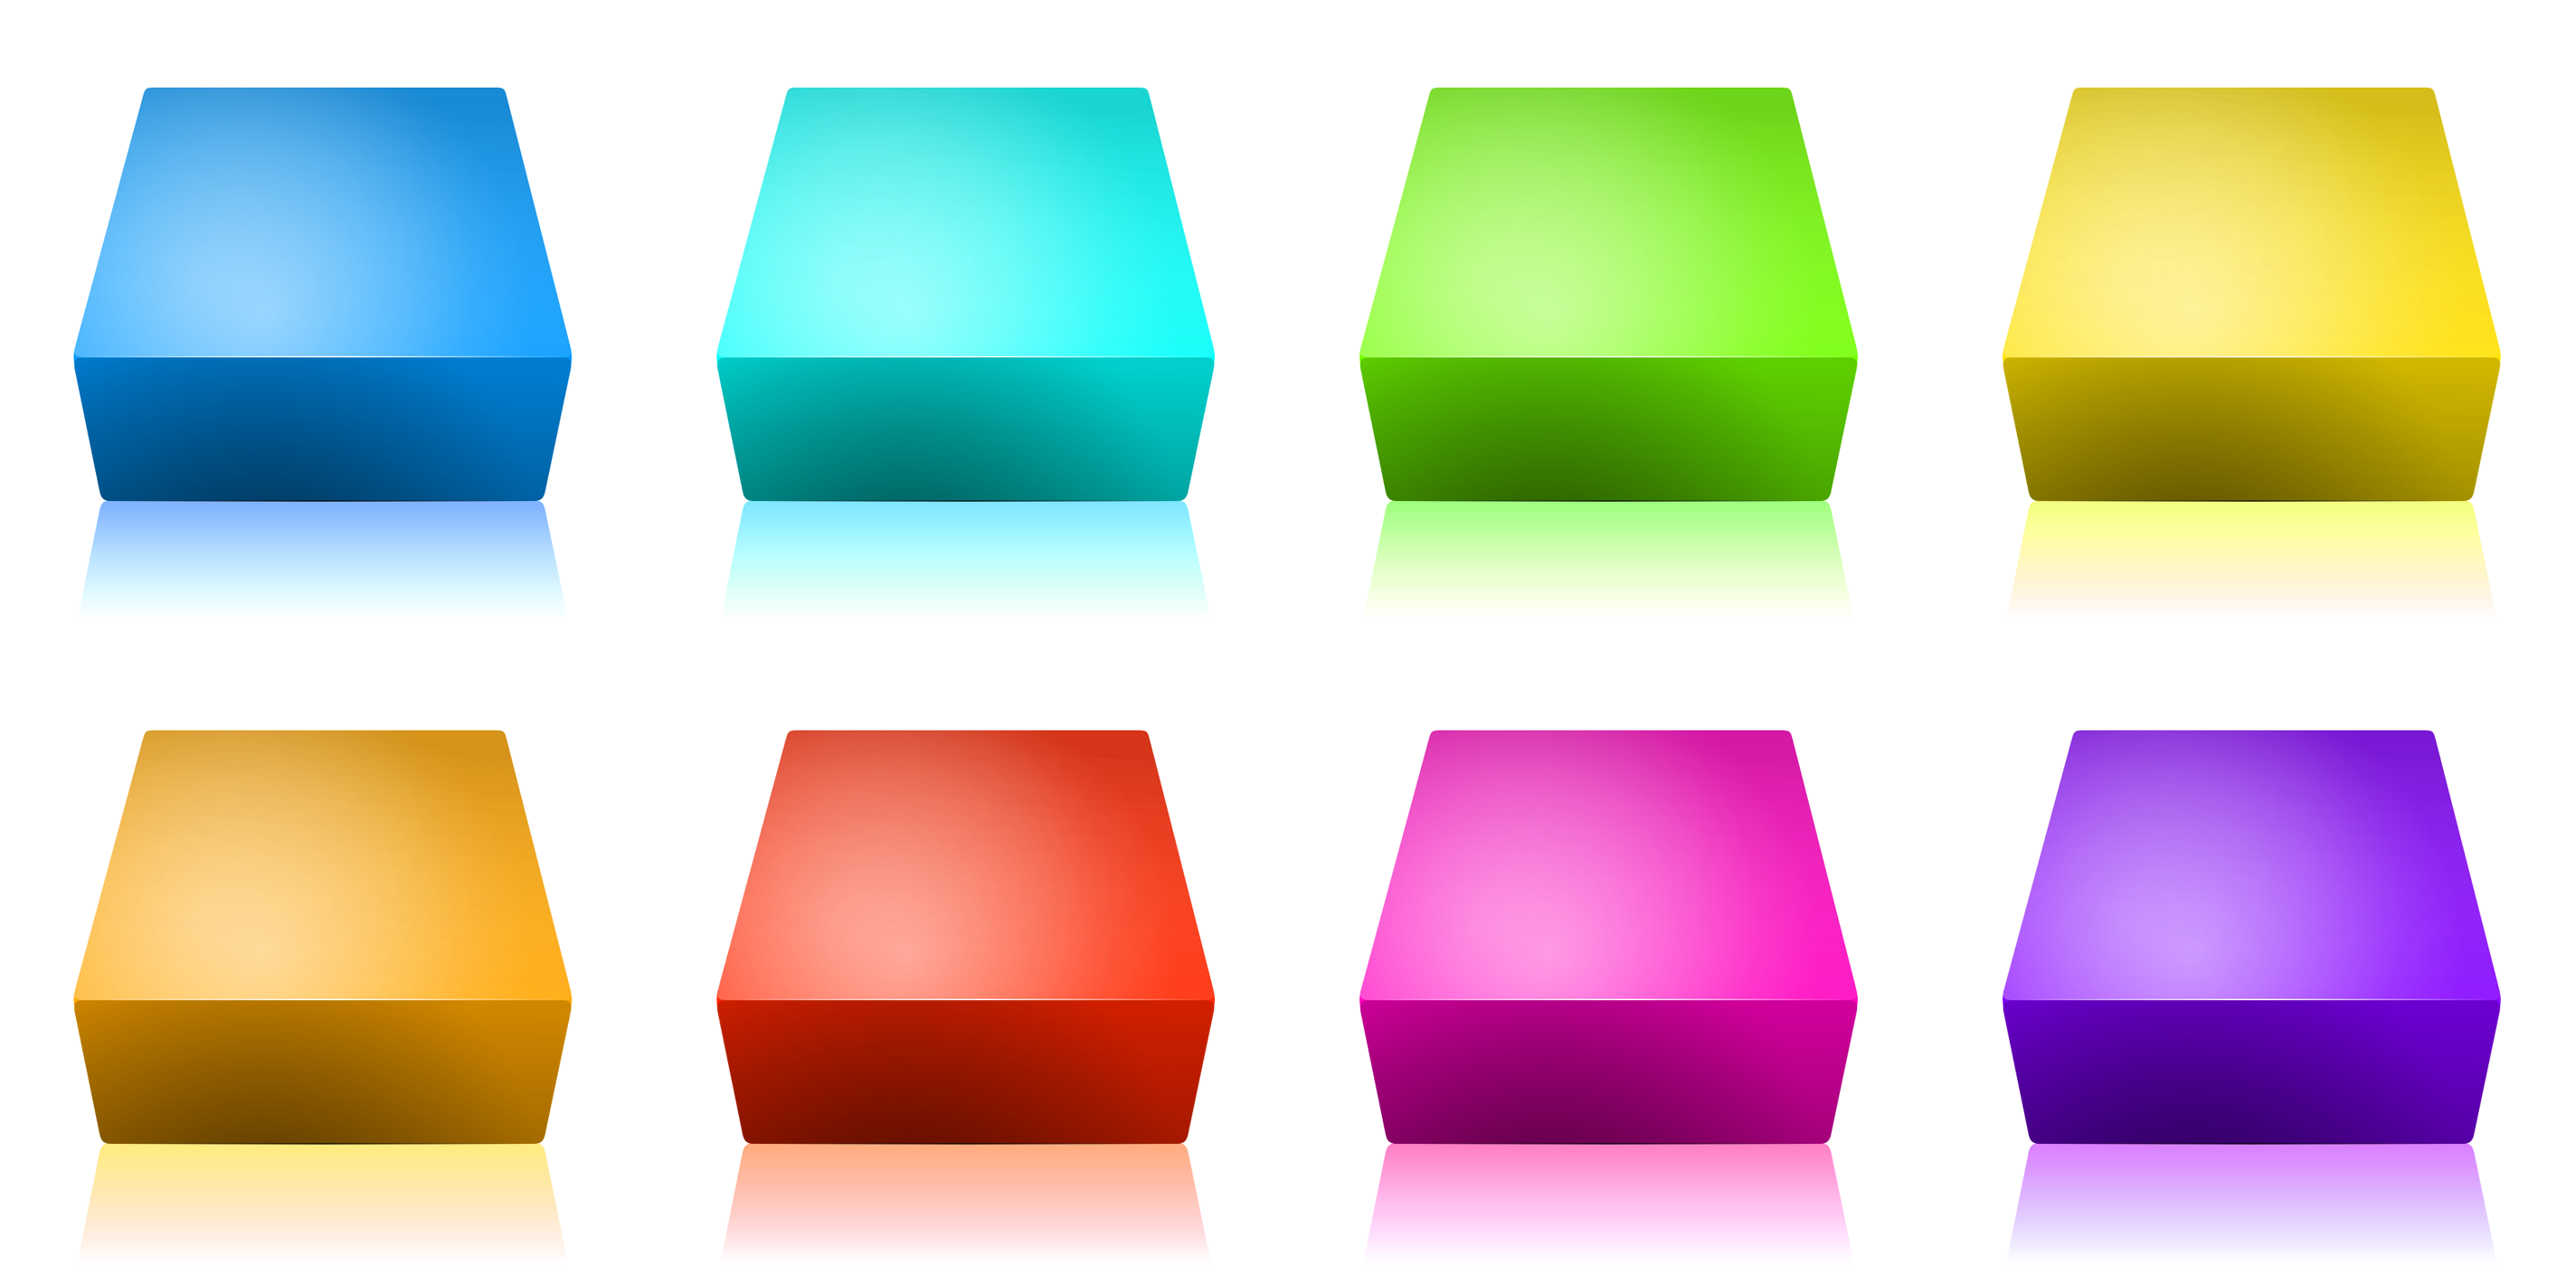 http://www.scottishborderswebsitedesign.co.uk/blog/wp-content/uploads/2015/01/free-multicoloured-blank-3d-square-iconset.png 3d